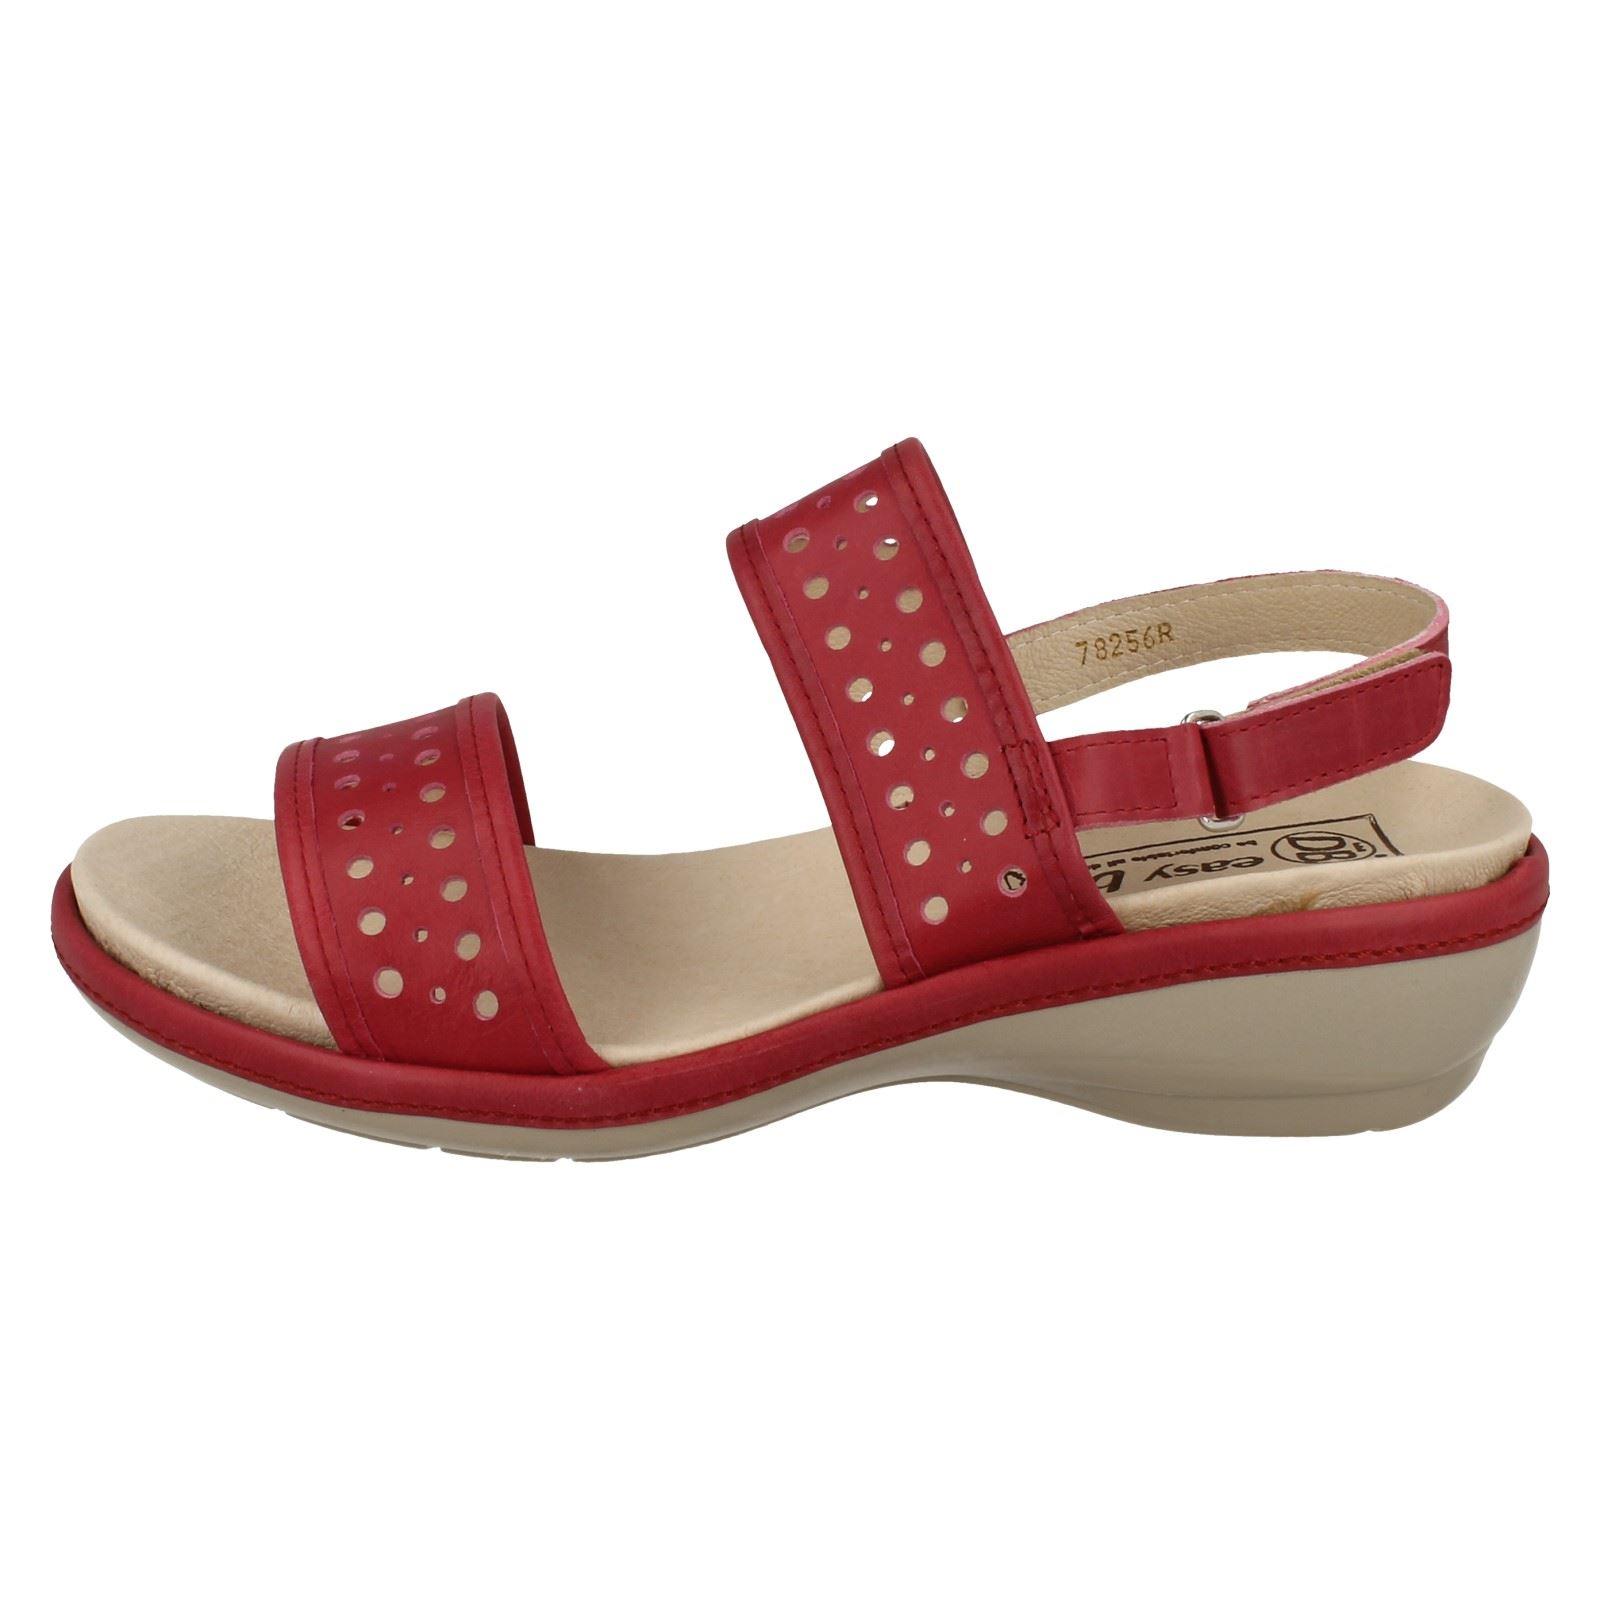 Easy B Ladies Comfortable Strappy Sandals Crete